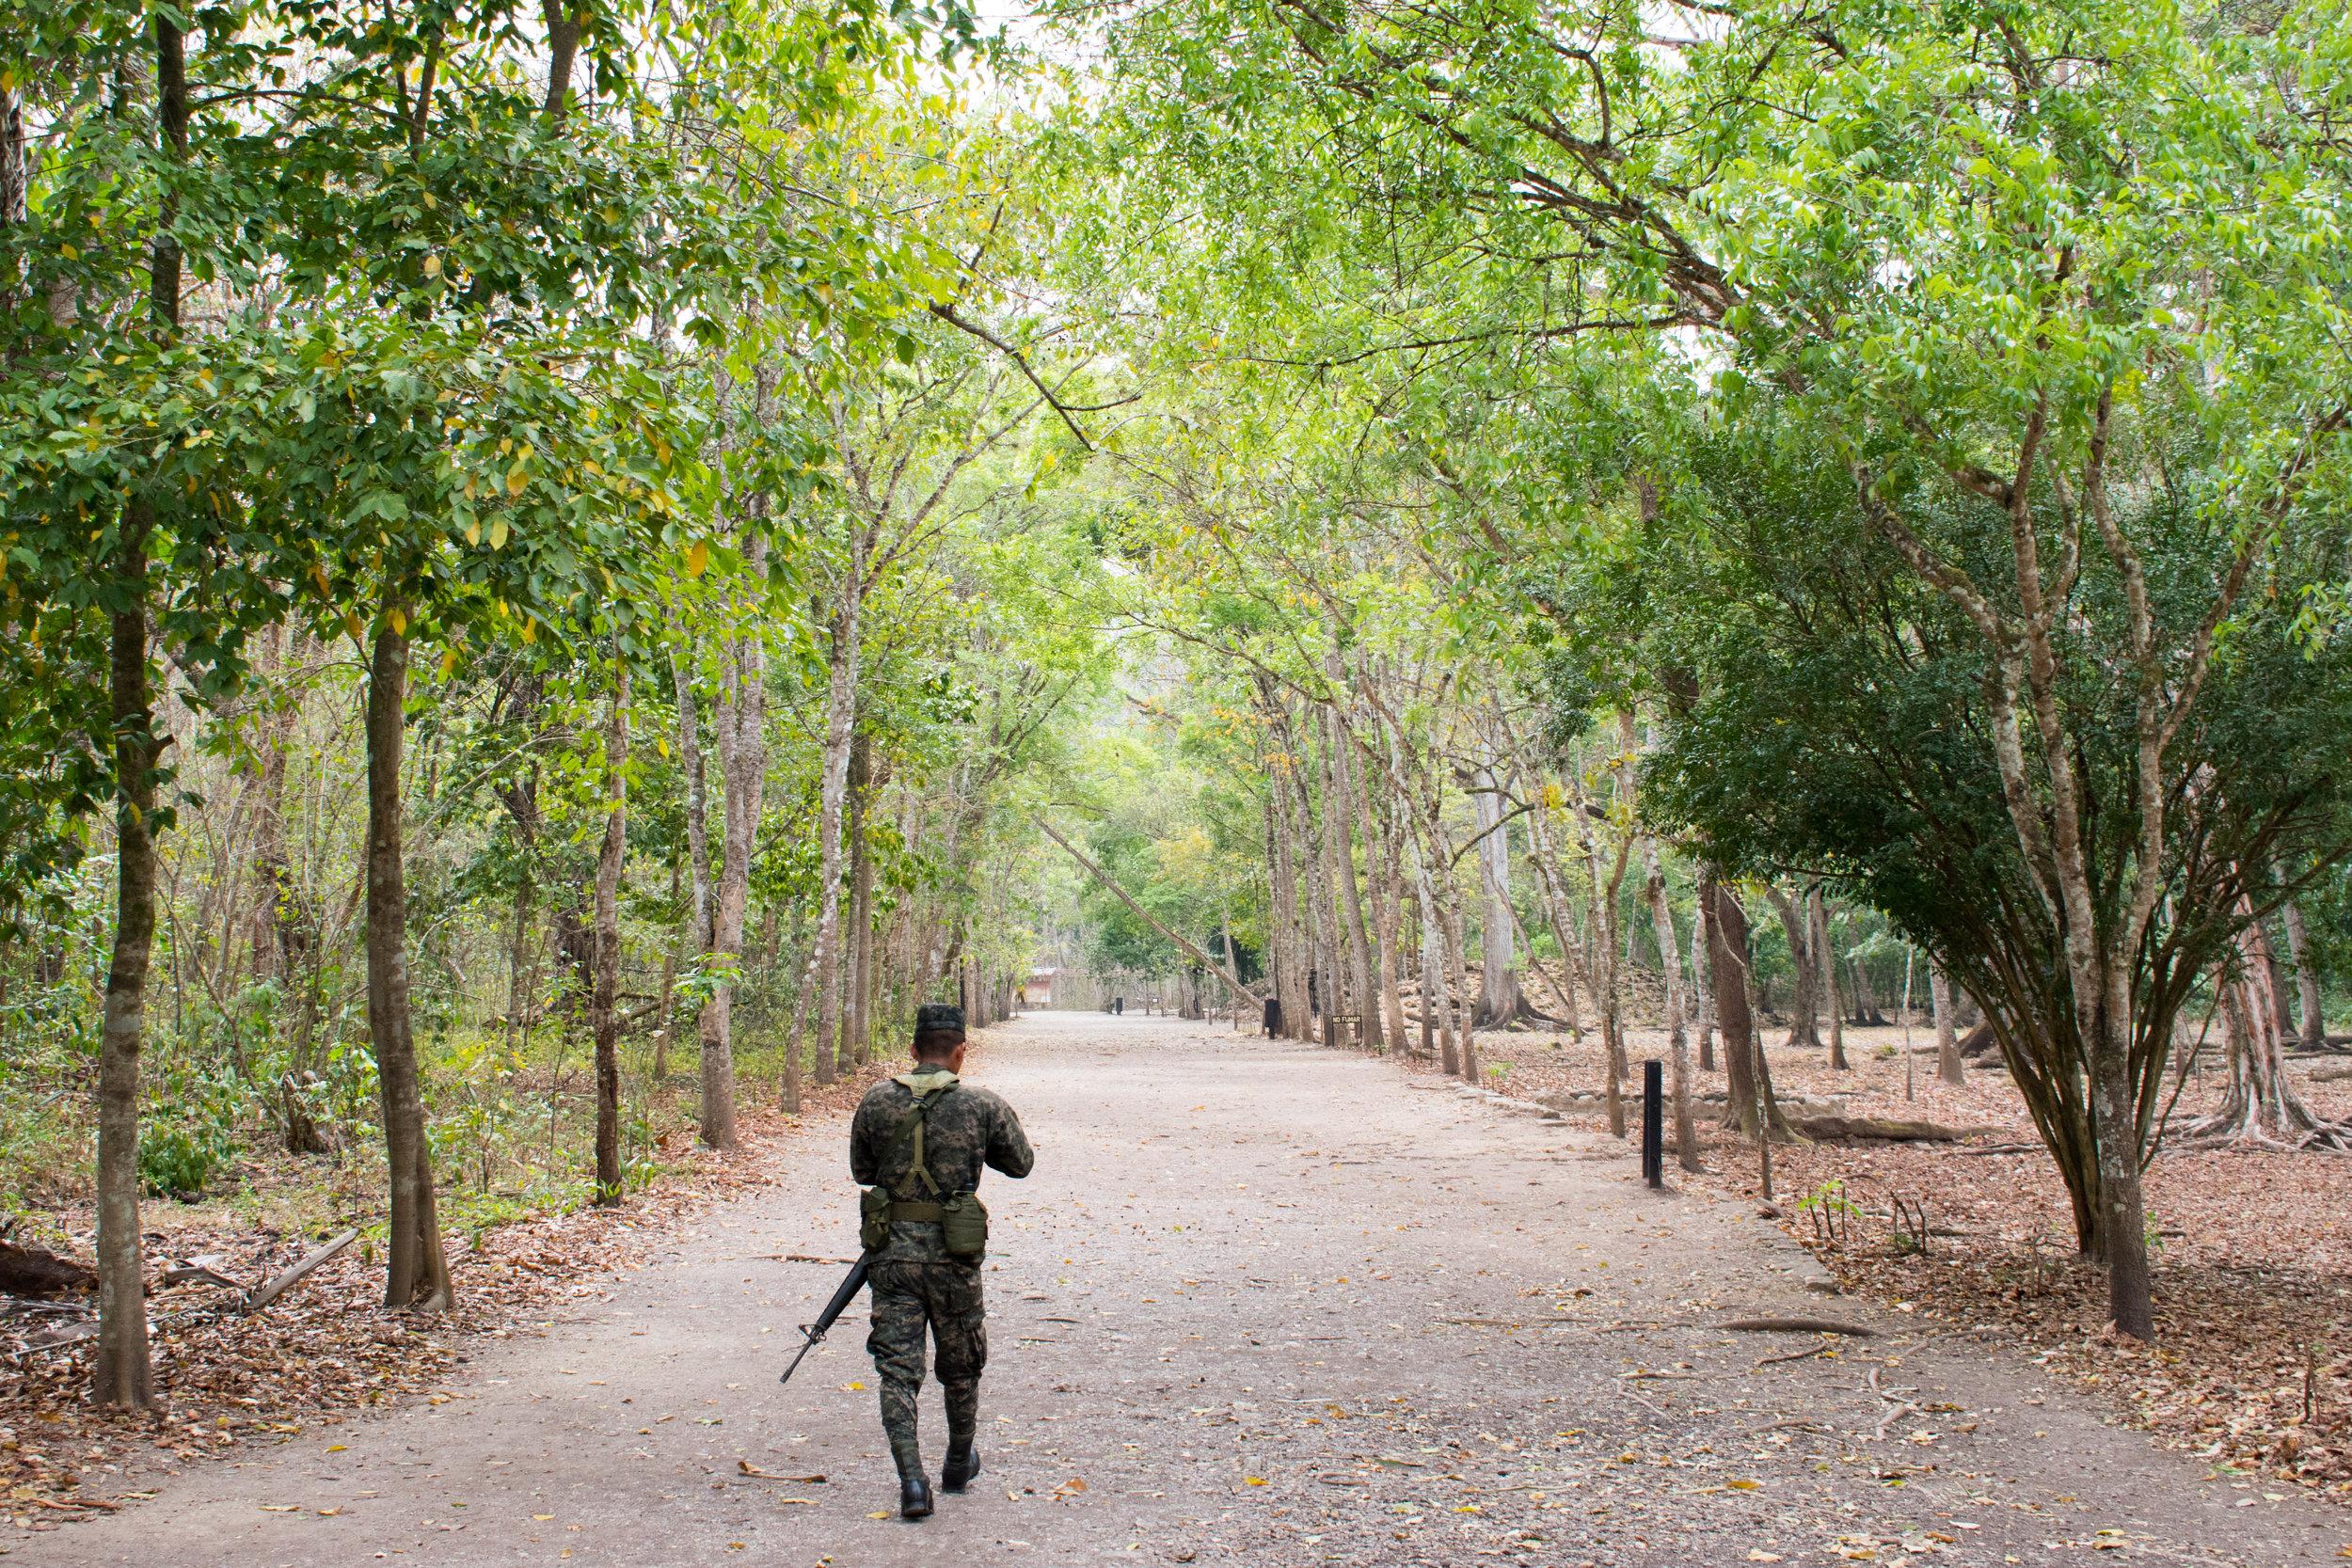 An Armed Guard Patrols the Ruins of Copán in Honduras